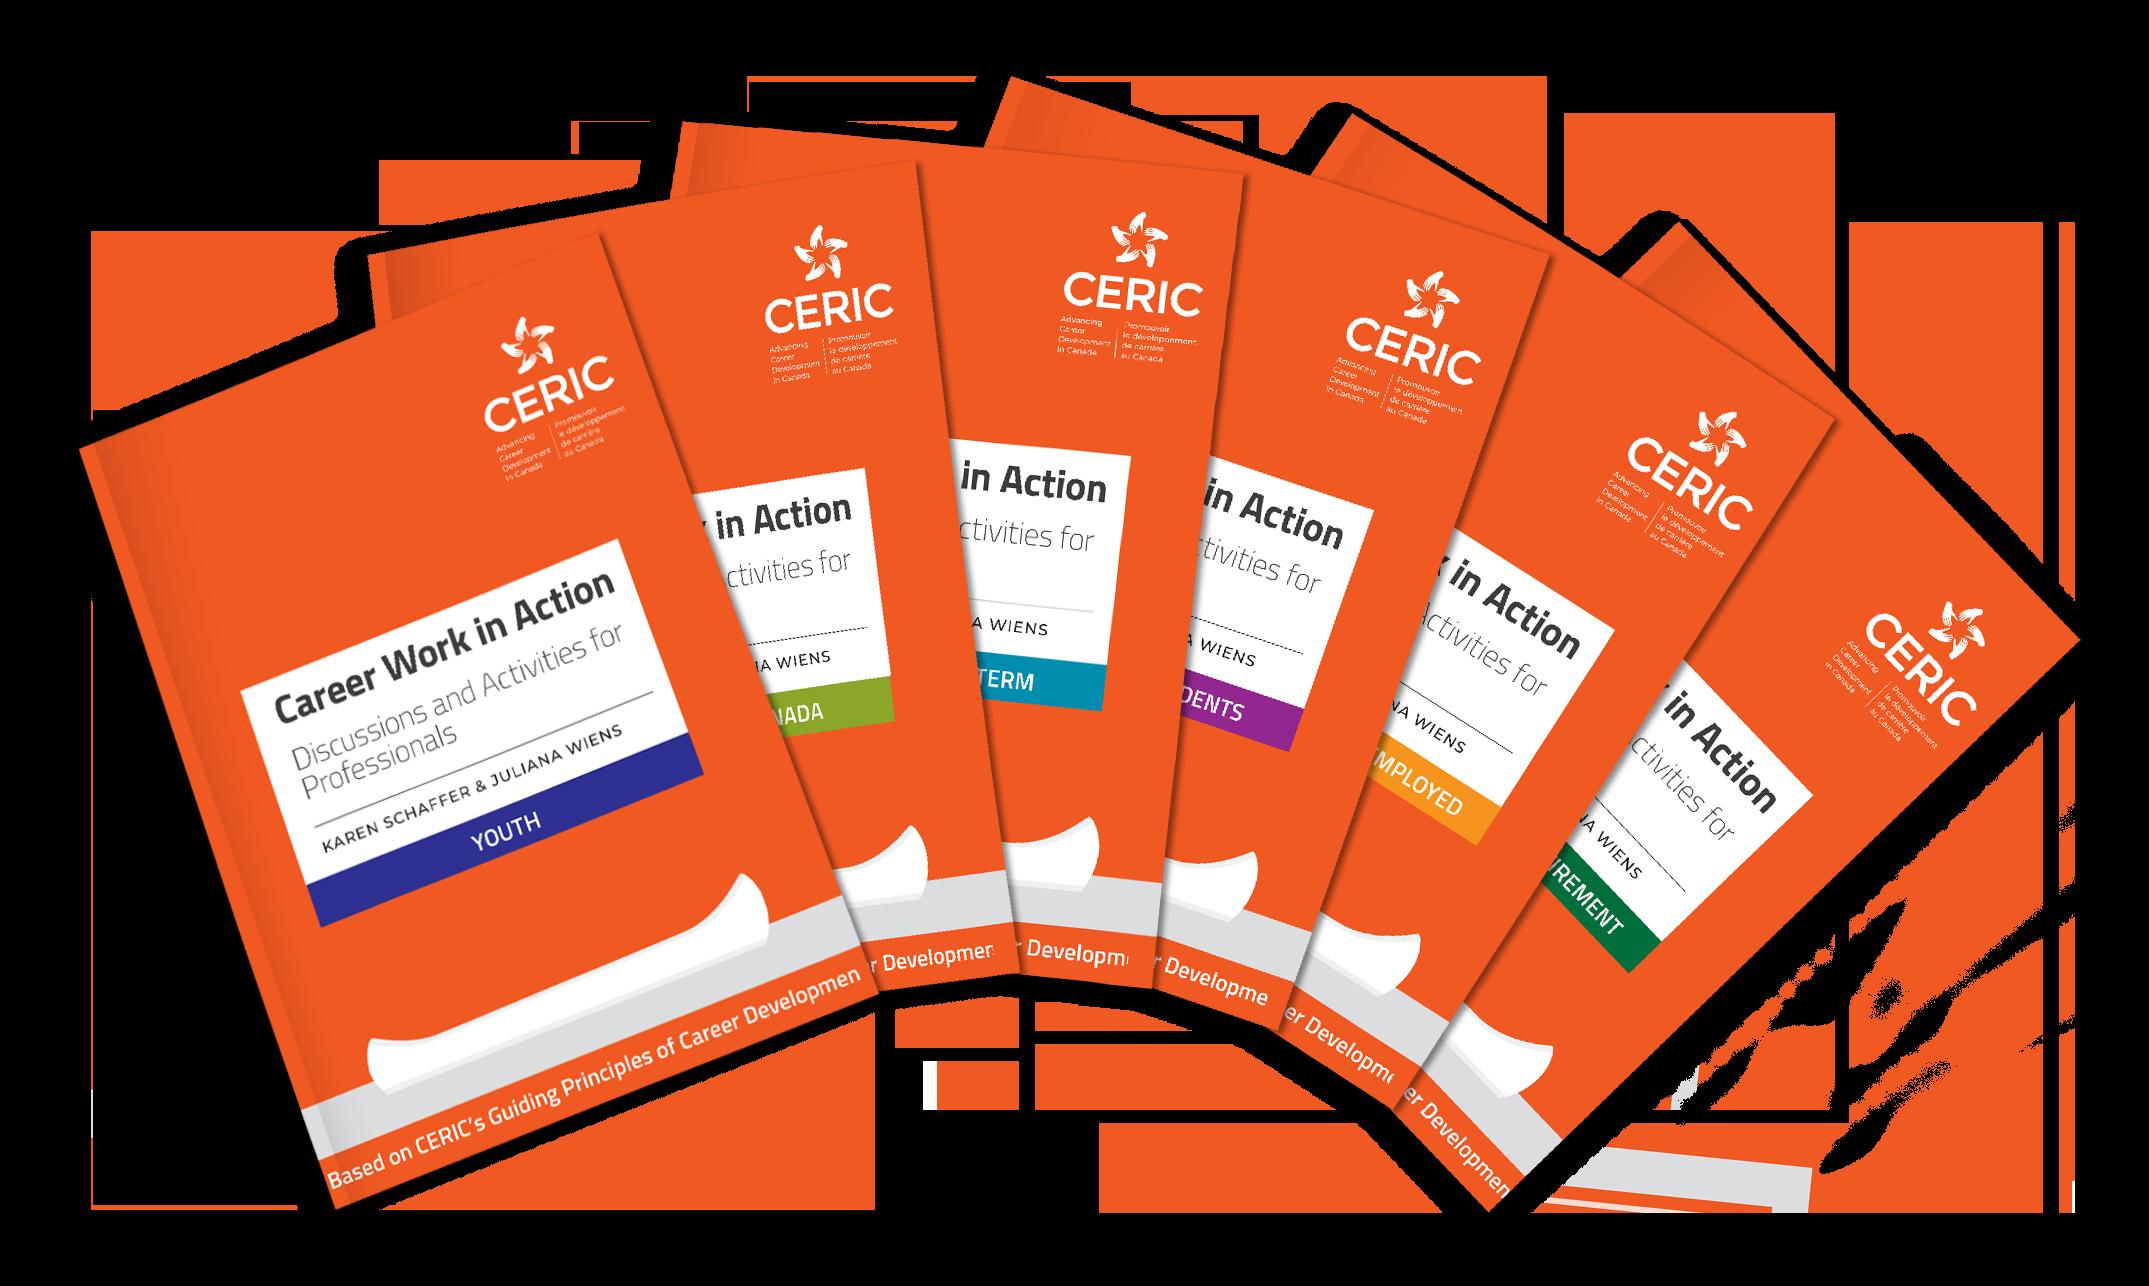 CERIC | Advancing Career Development in Canada